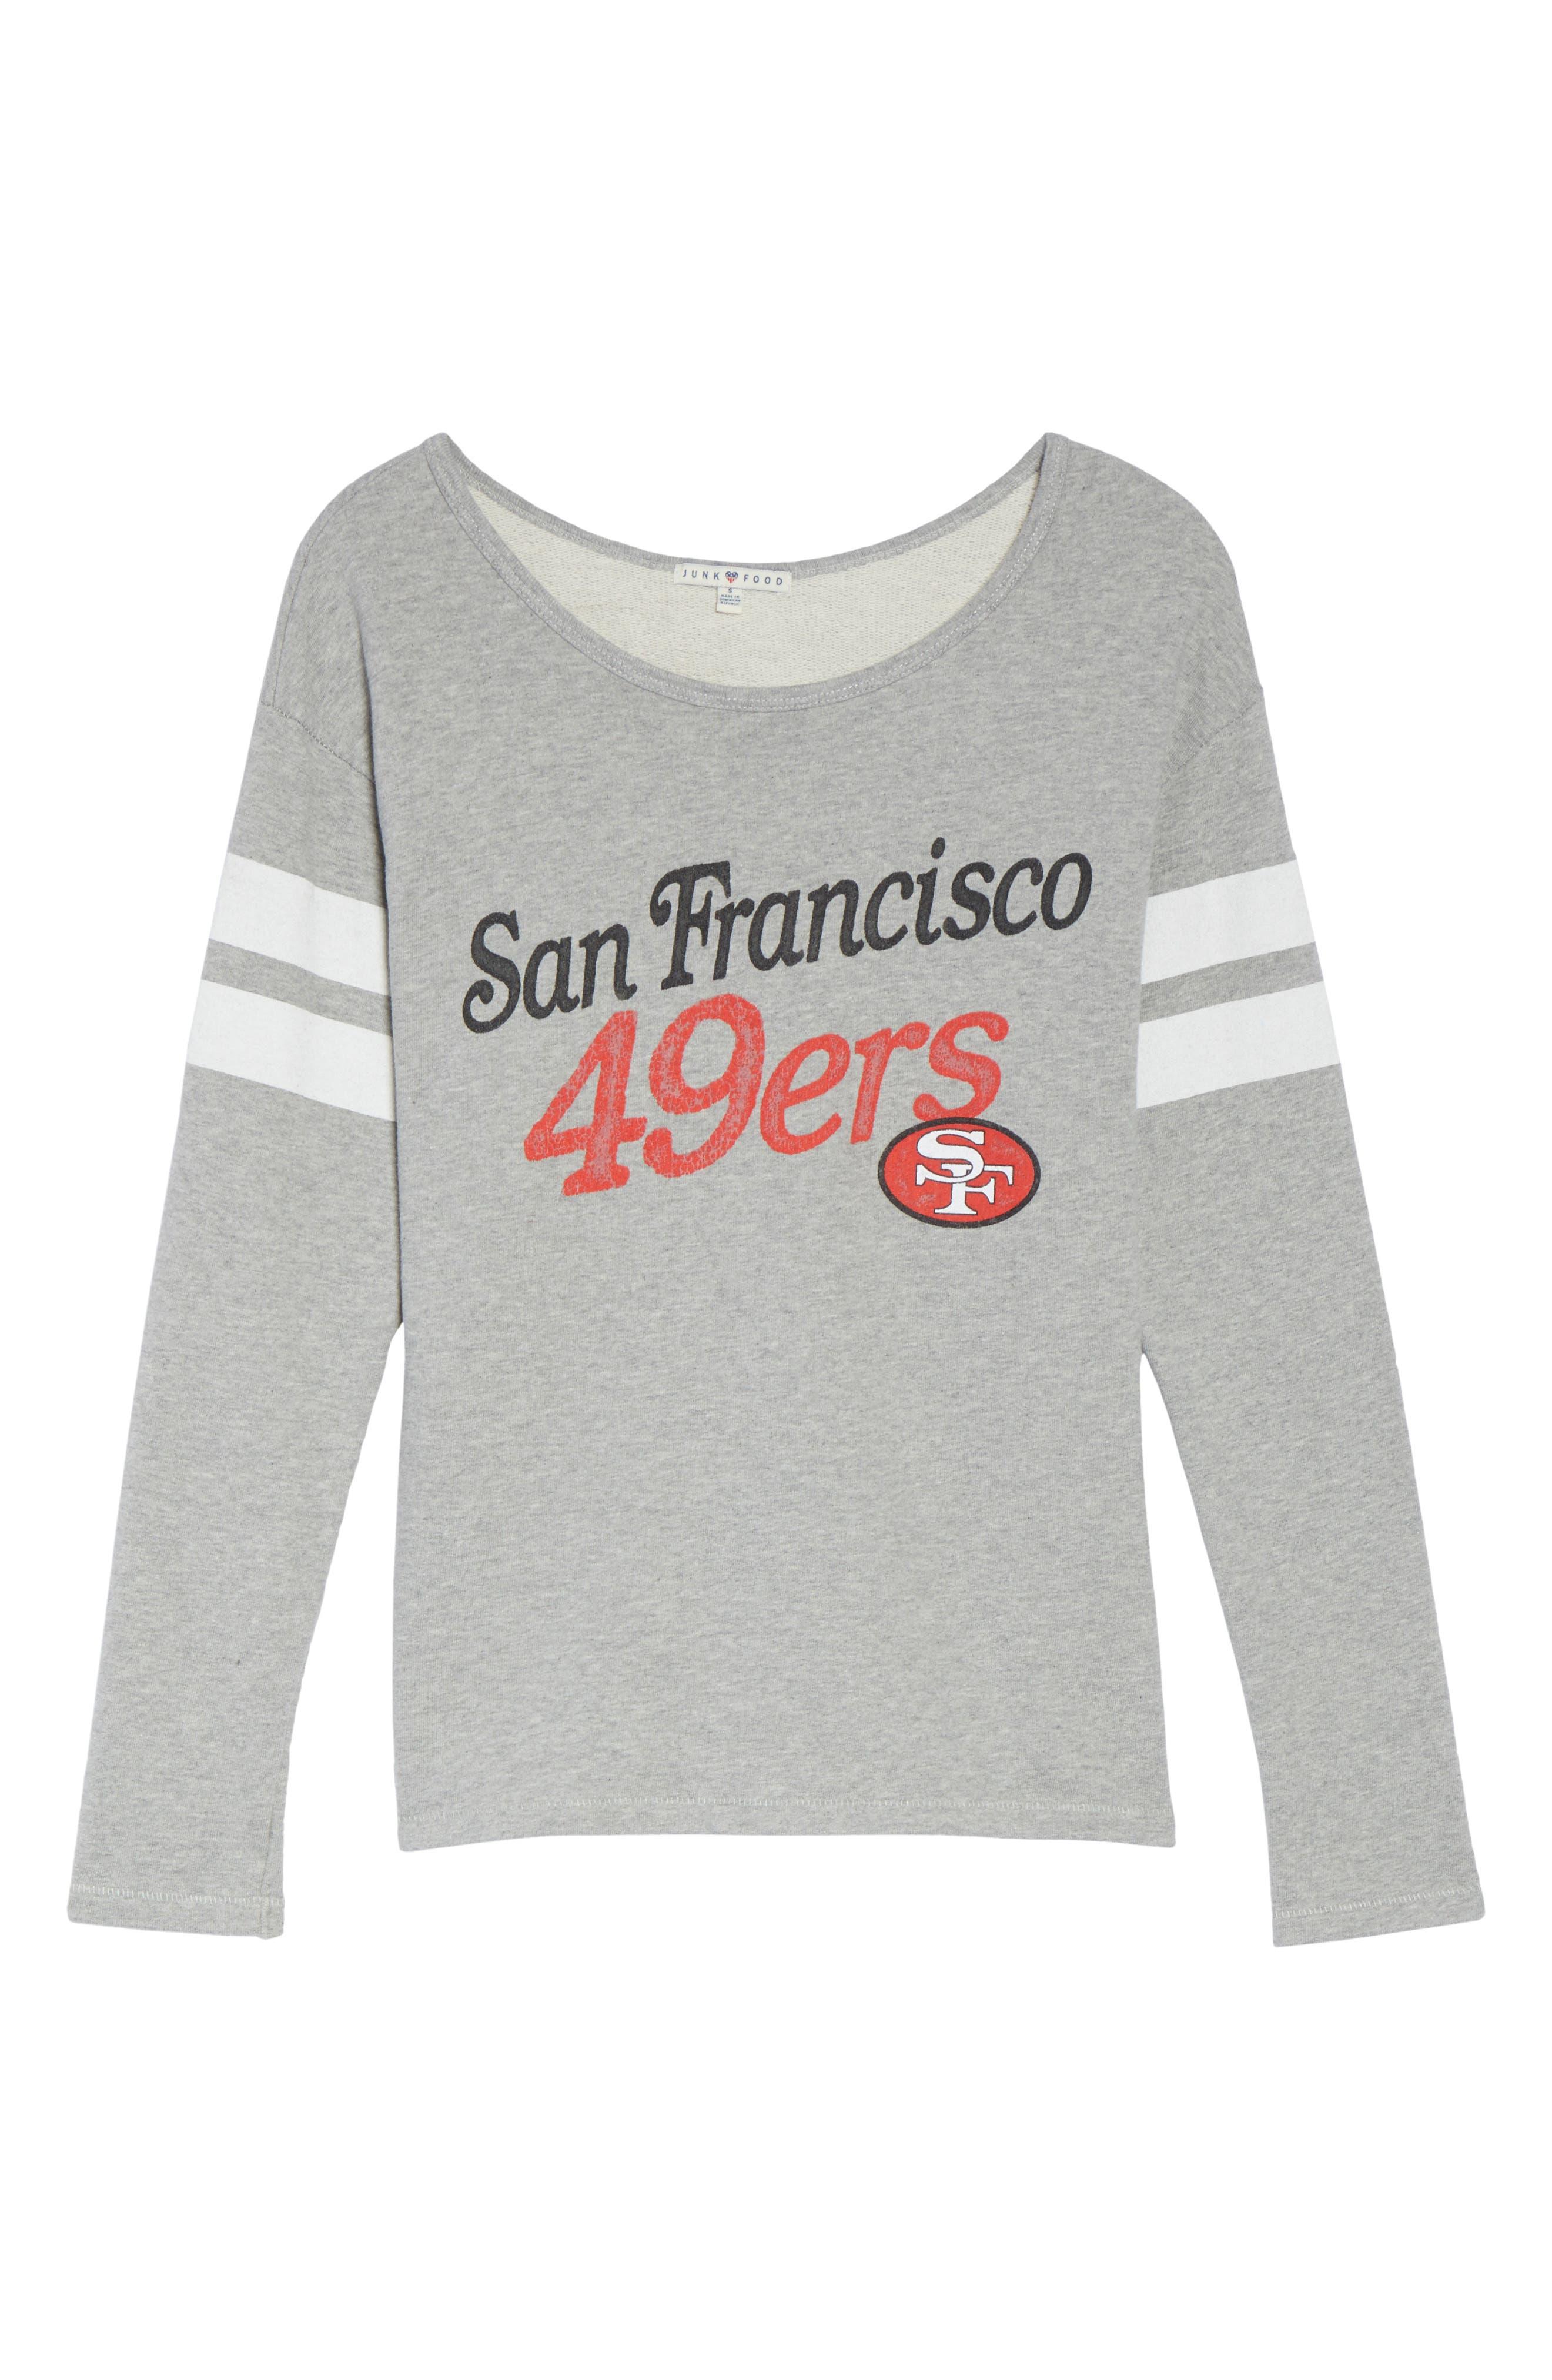 NFL San Francisco 49ers Champion Sweatshirt,                             Alternate thumbnail 6, color,                             028